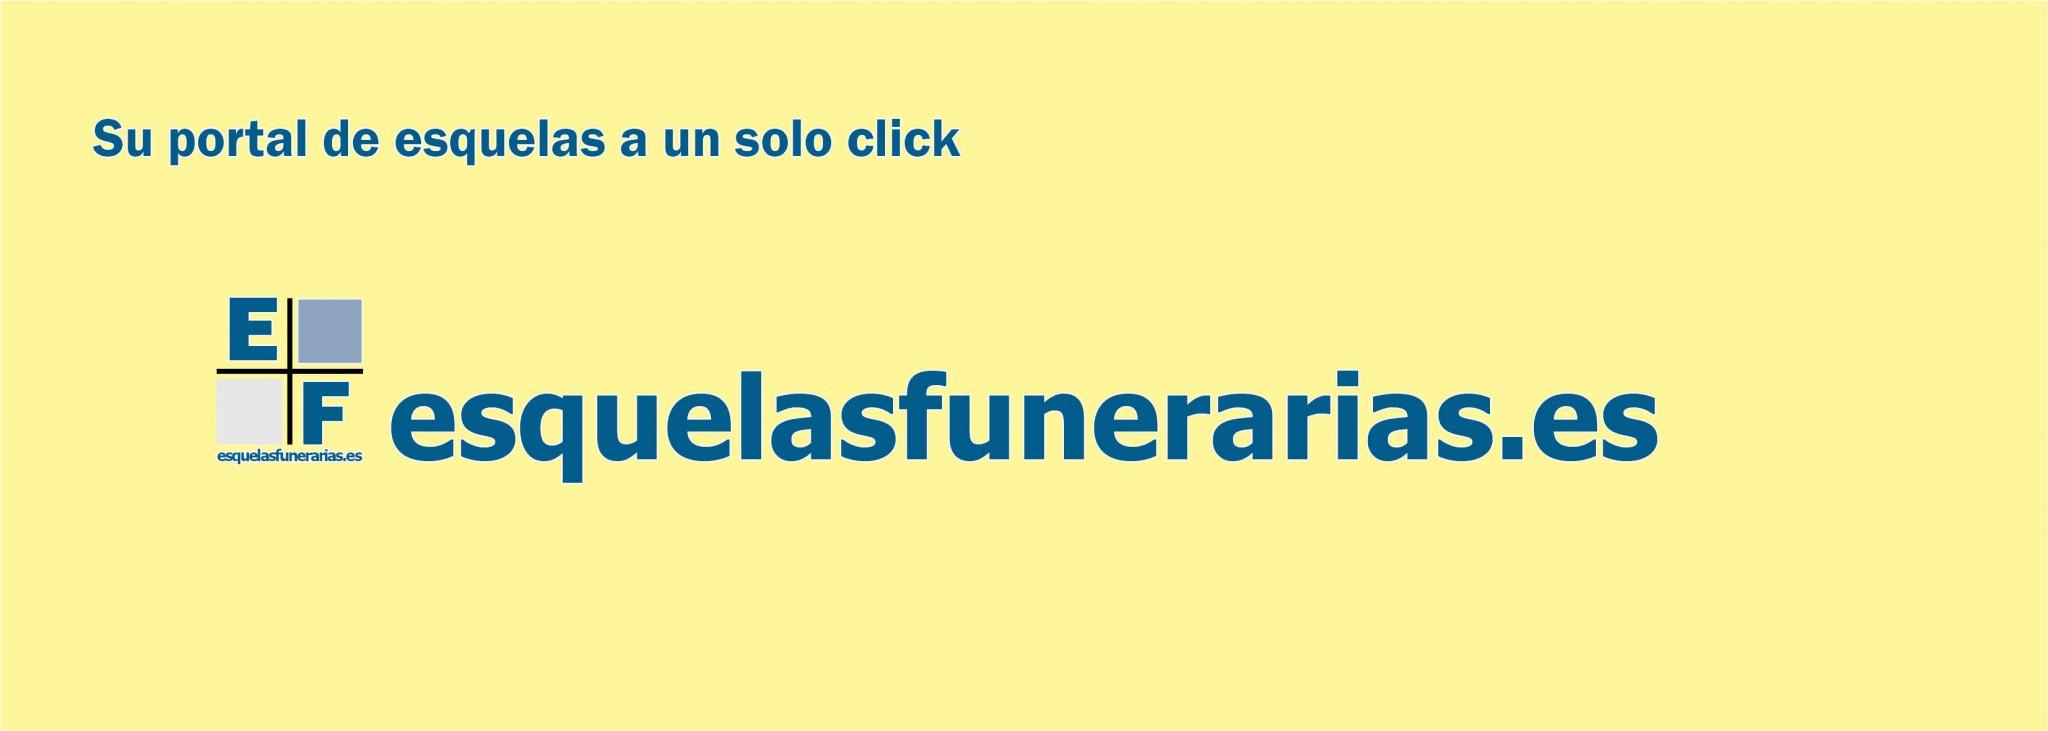 fotoweb cuadrada